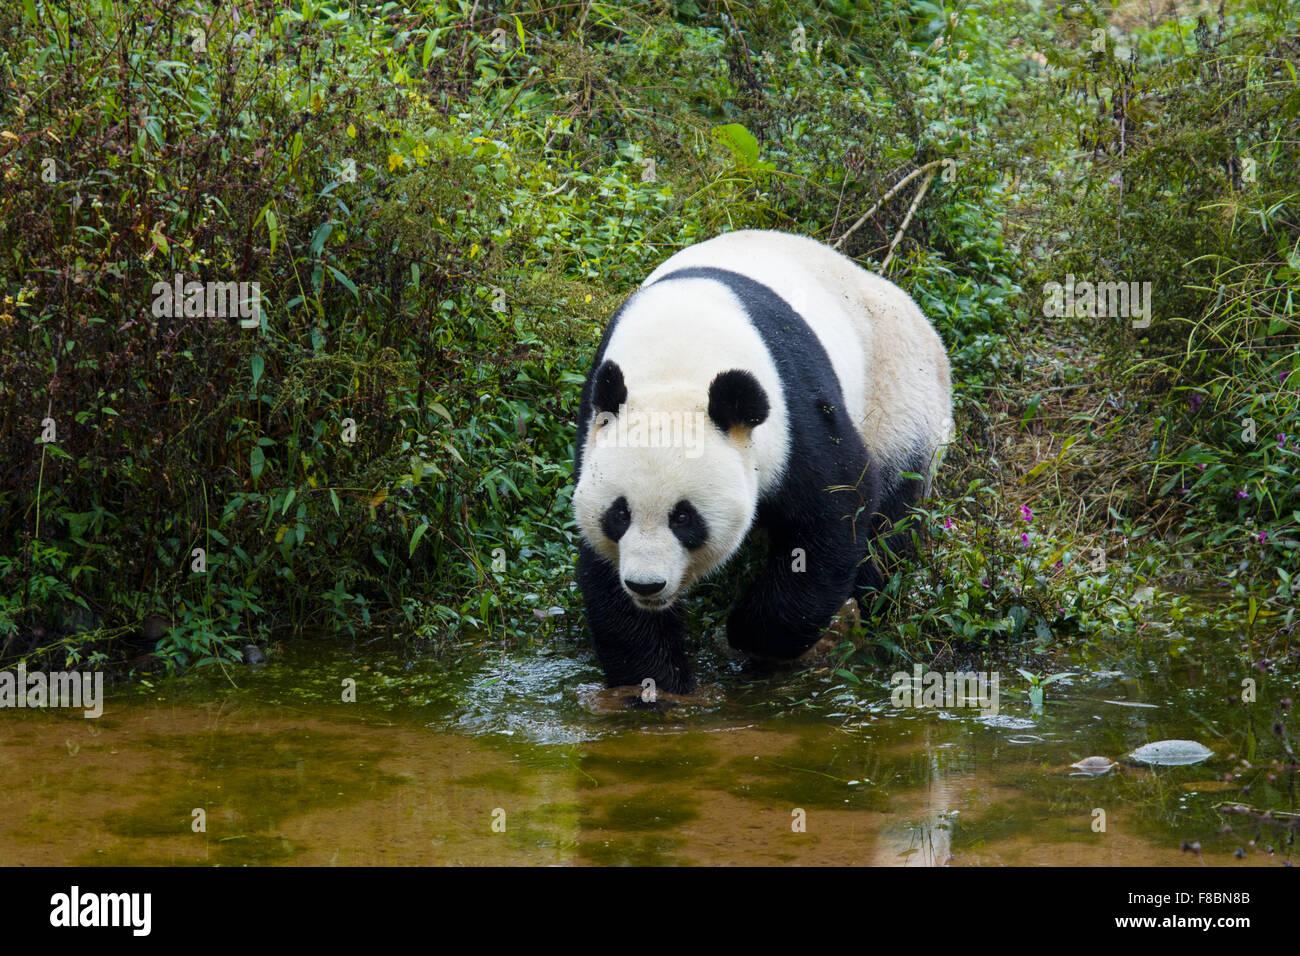 Panda Ailuropoda melanoleuca Bifengia Panda Base Sichuan Province China MA003062 - Stock Image